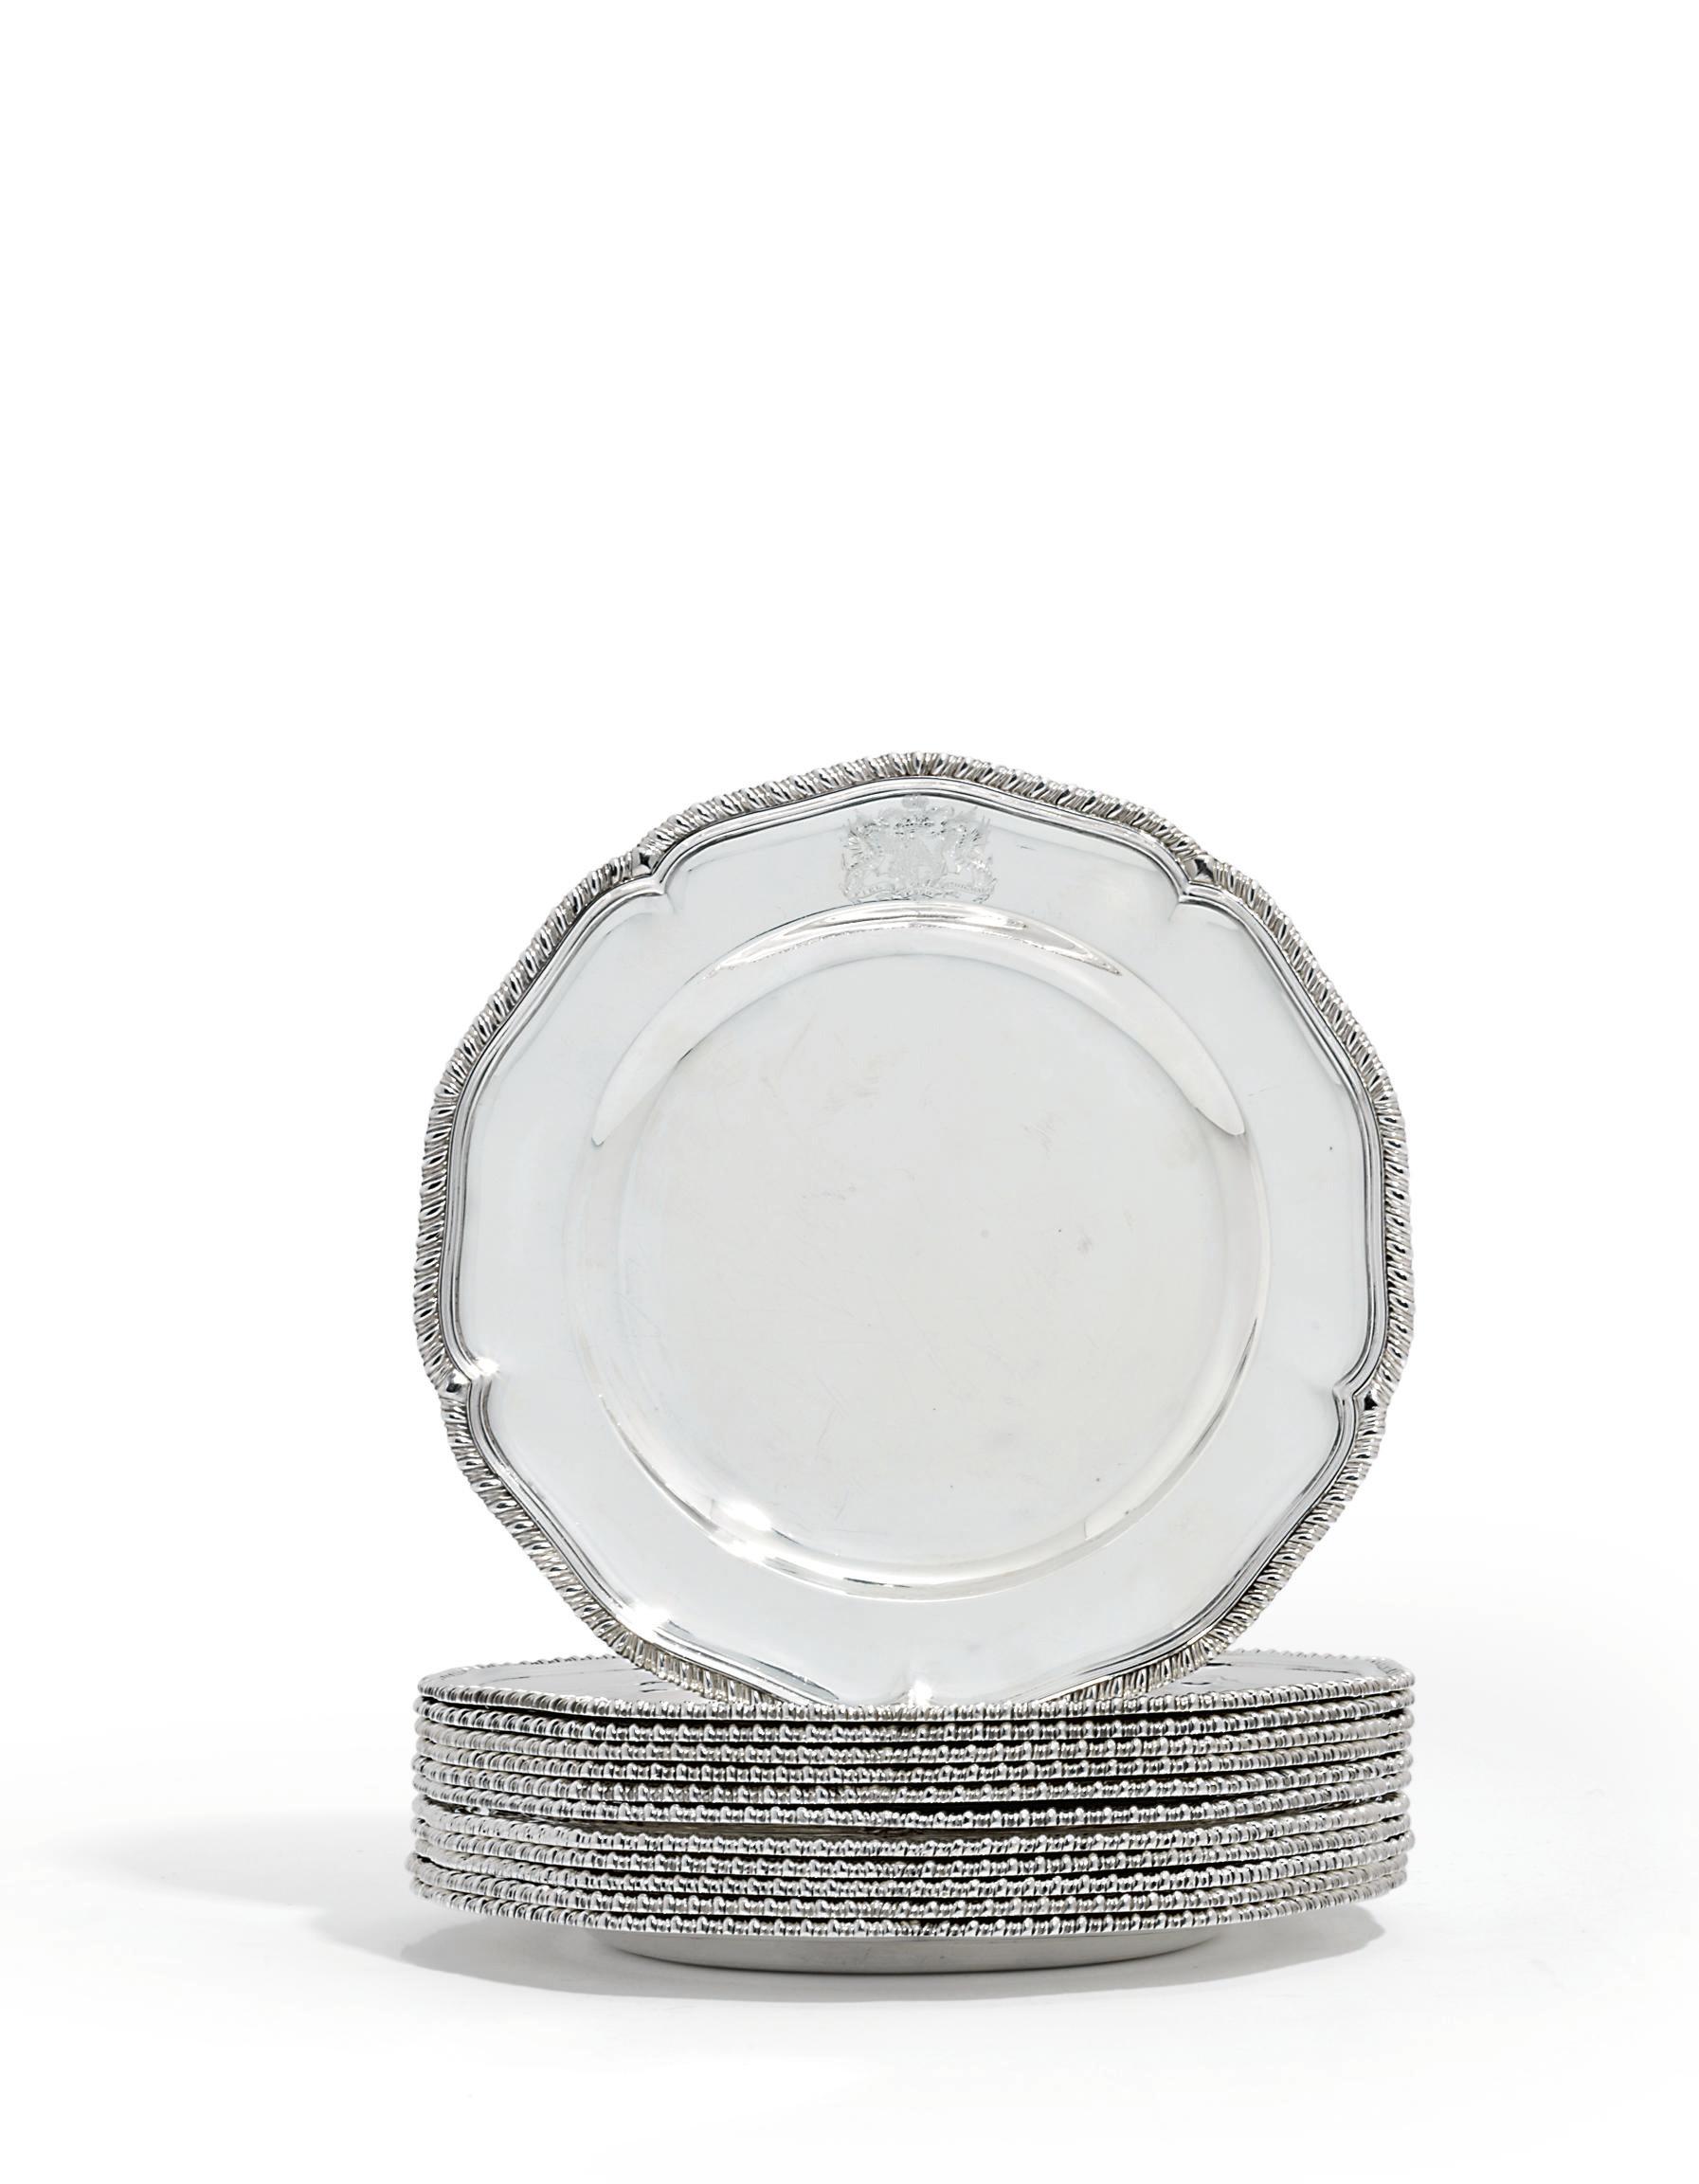 A SET OF TWELVE GEORGE III SILVER DINNER-PLATES